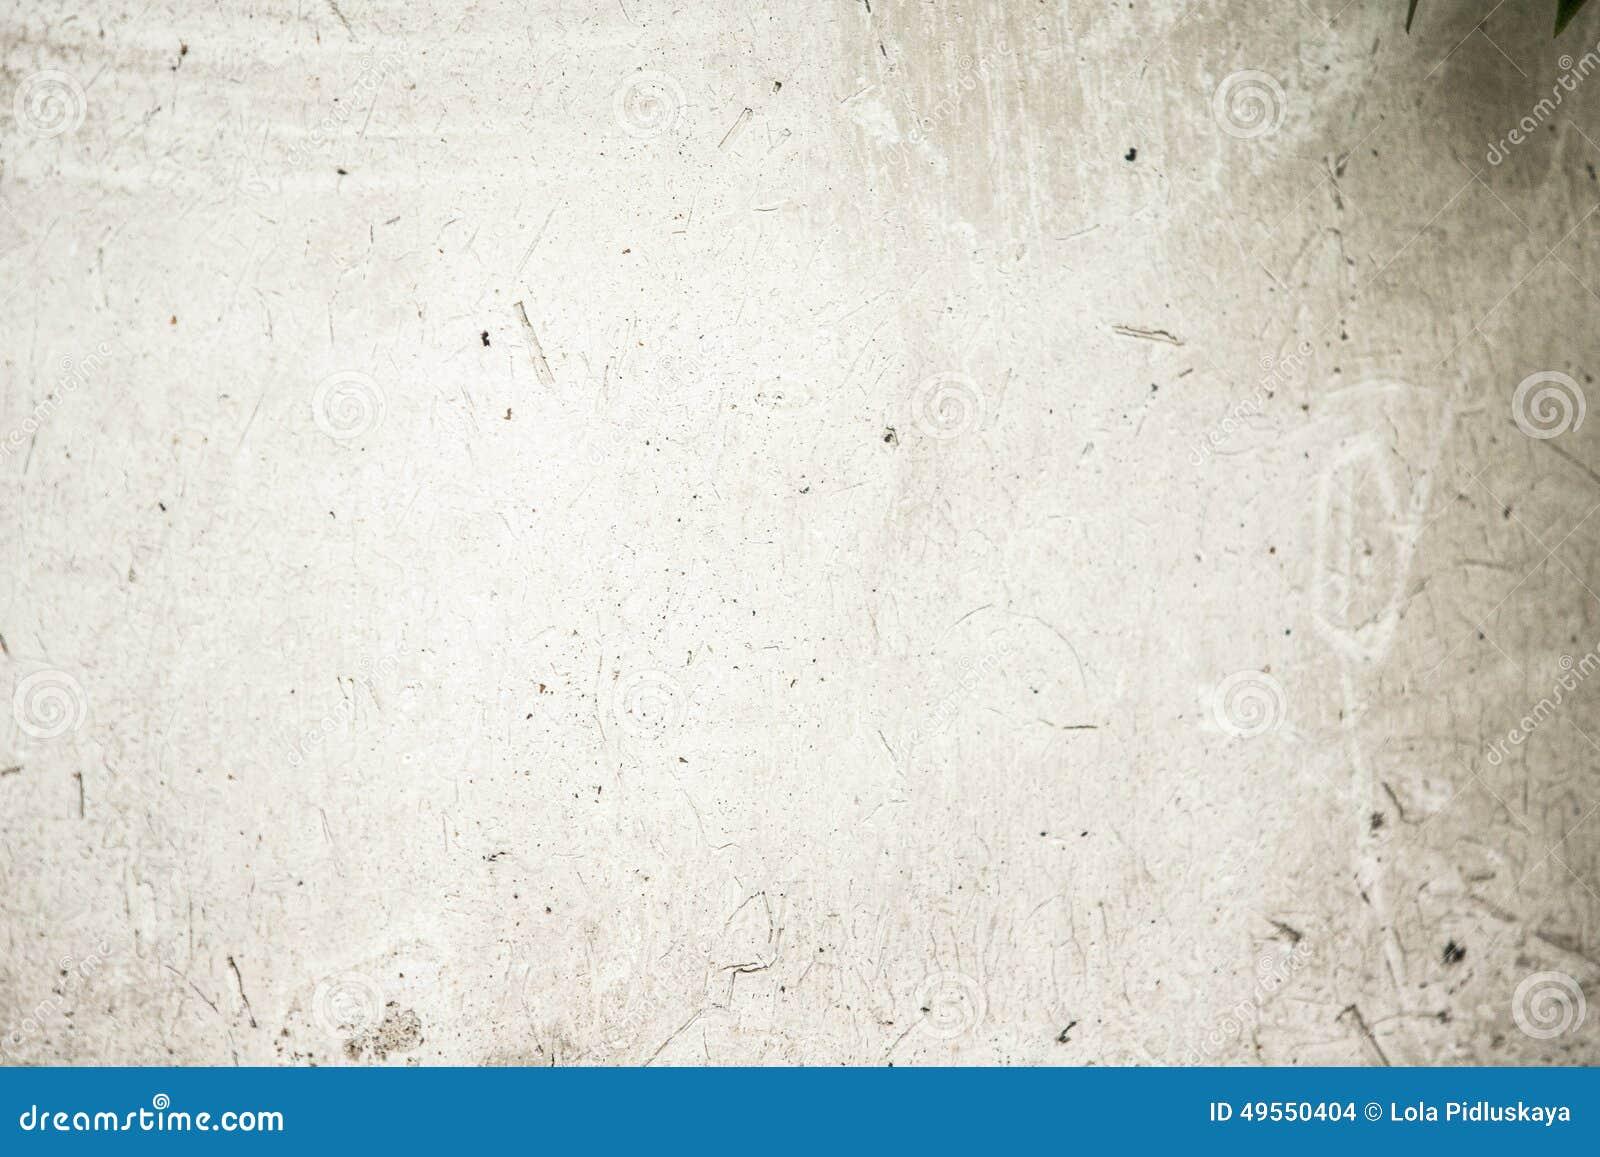 Textura Pared Blanca Foto De Archivo Imagen De Shangai 49550404